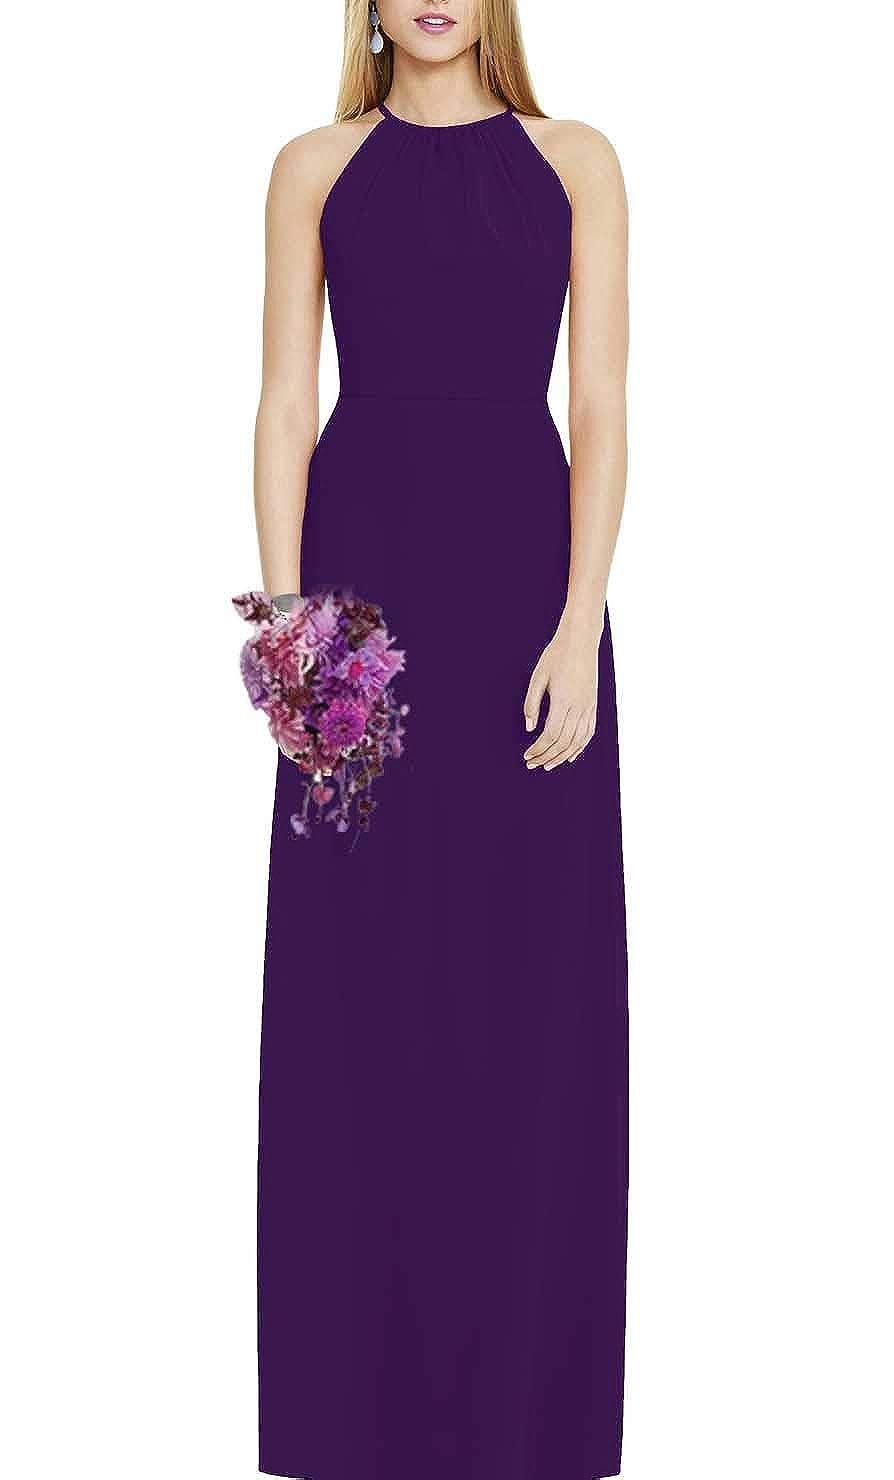 Dark Purple FeiYueXinXing Women's Halter Neck ALine Prom Ball Gowns Long Evening Bridesmaid Guest Dresses